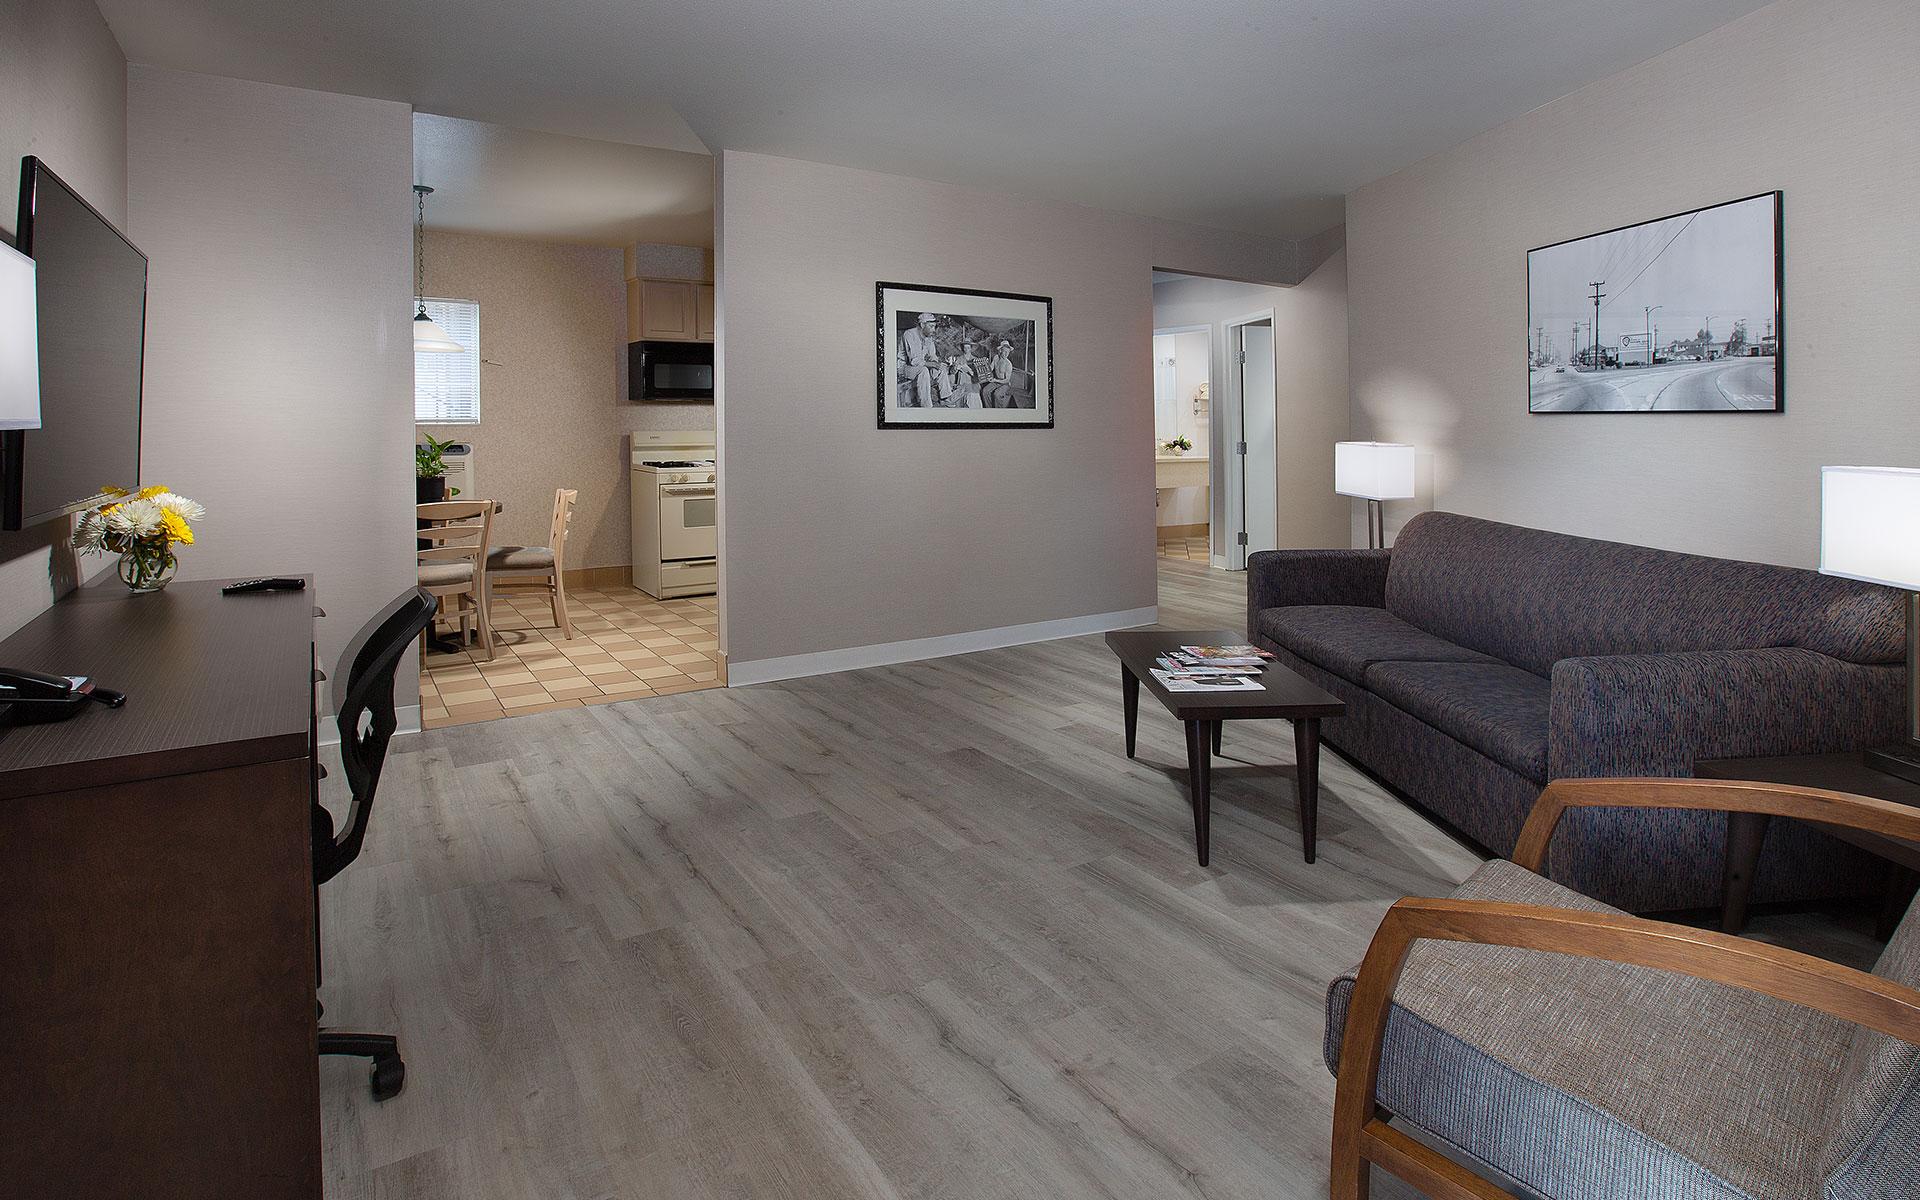 Safari Inn Burbank CA Accommodations Coast King Junior Suite